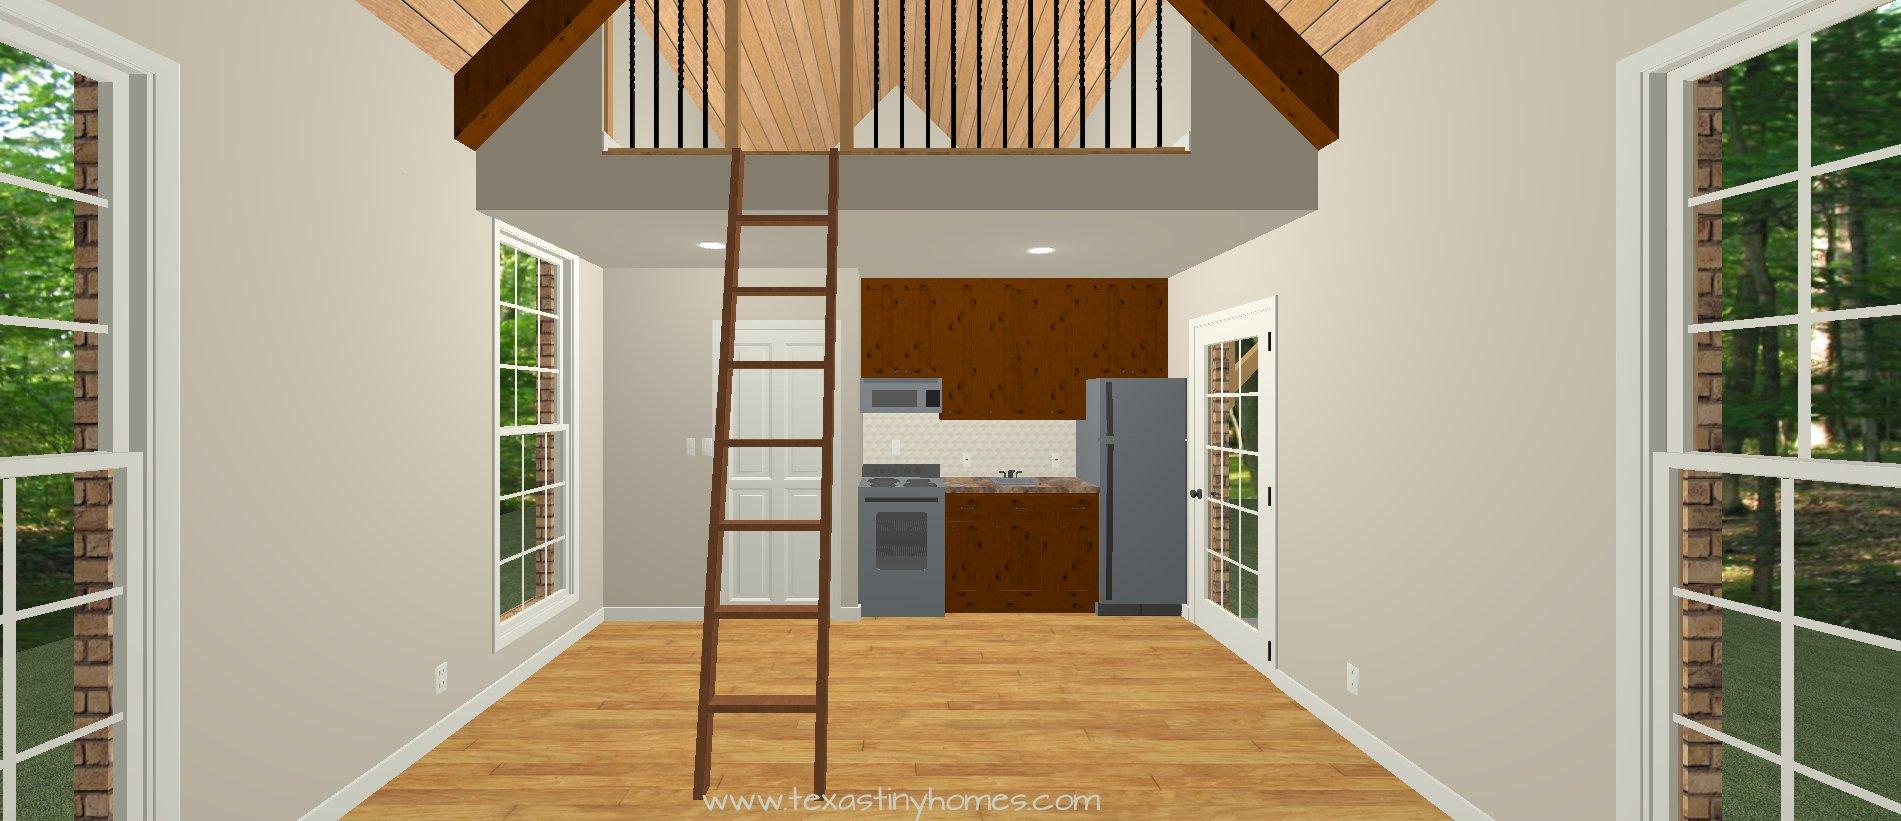 Texas Tiny Homes Plan 516